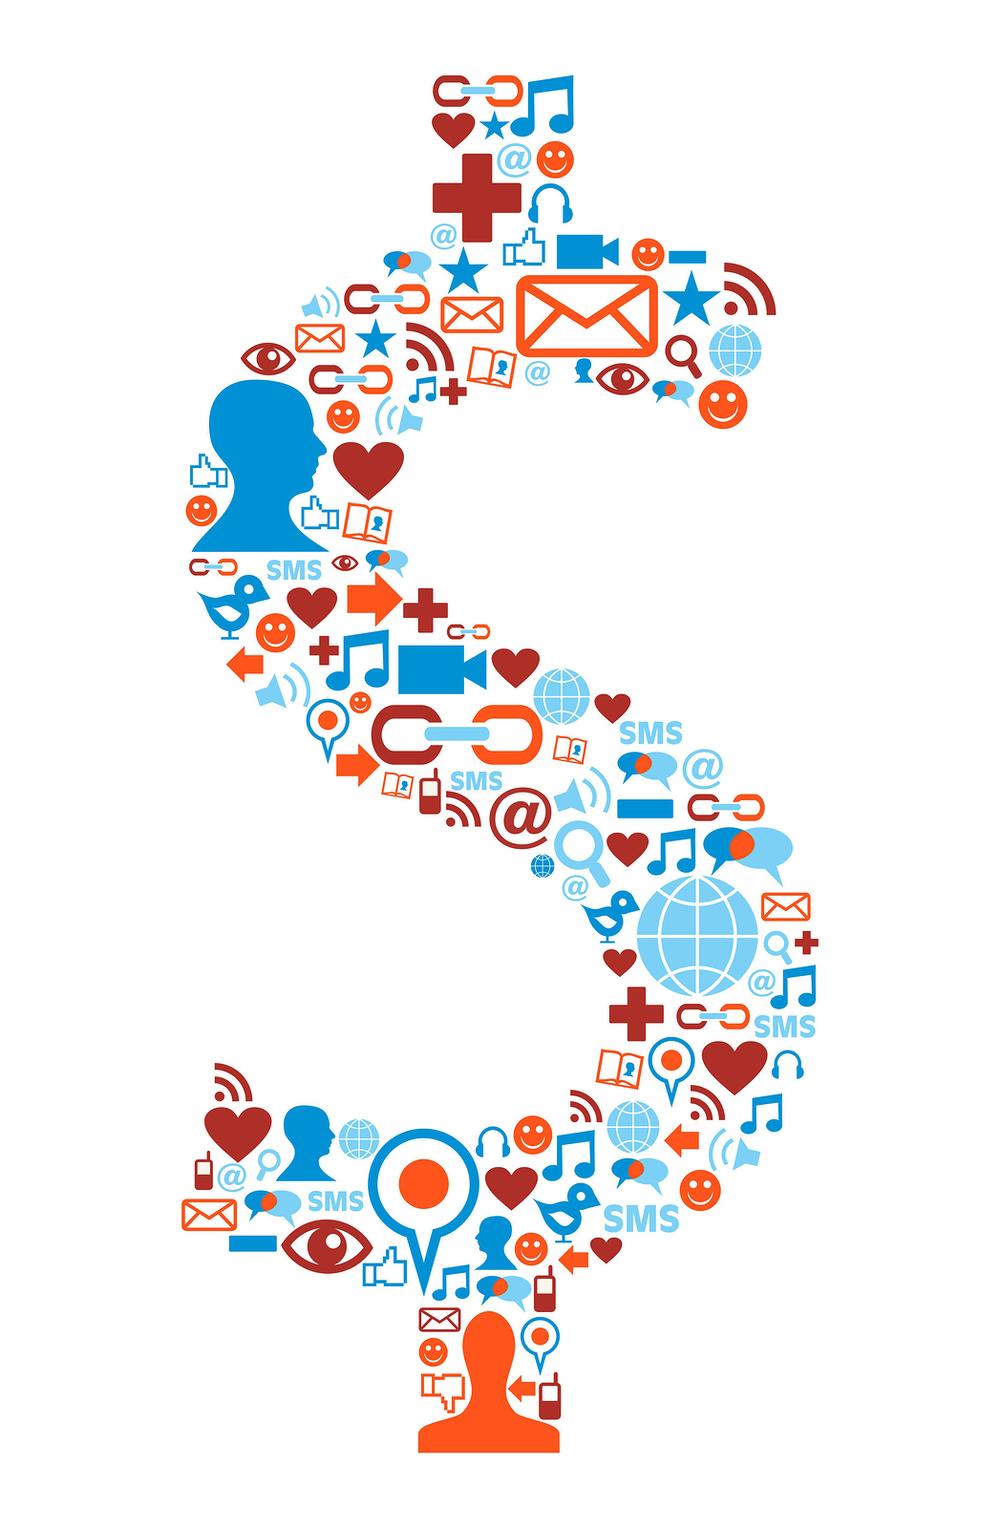 bigstock-Social-Media-Icons-Set-In-Doll-24488042.jpg